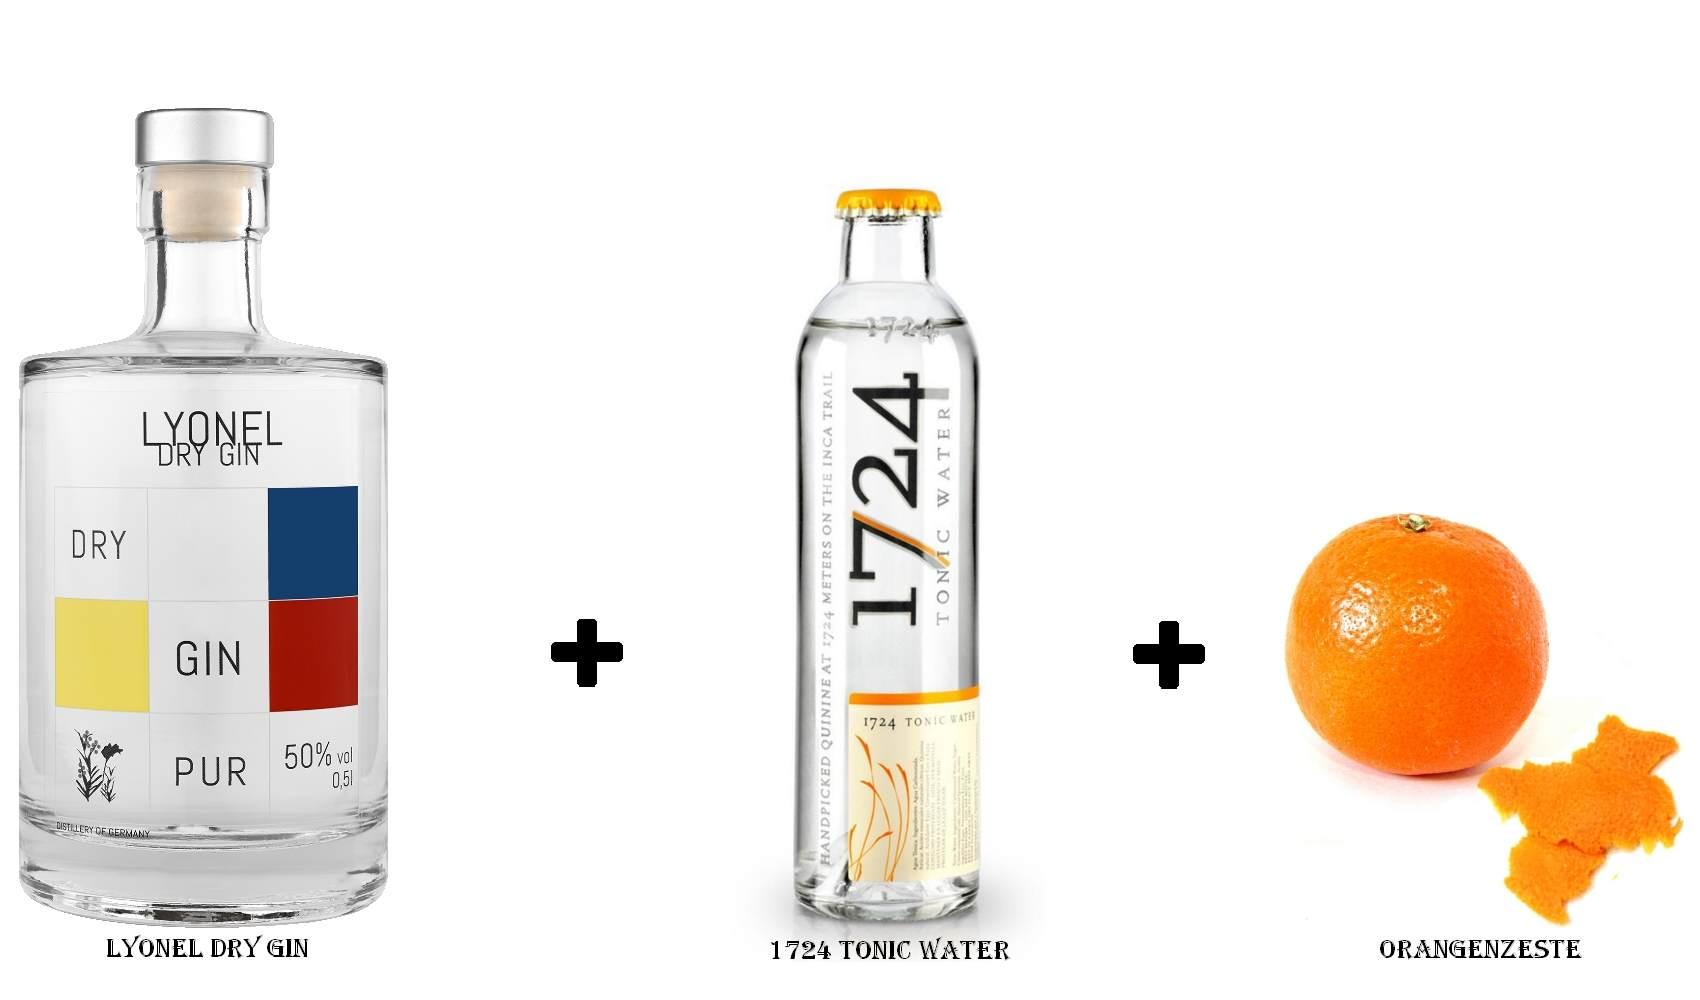 Lyonel Dry Gin + 1724 Tonic Water + Orangenzeste